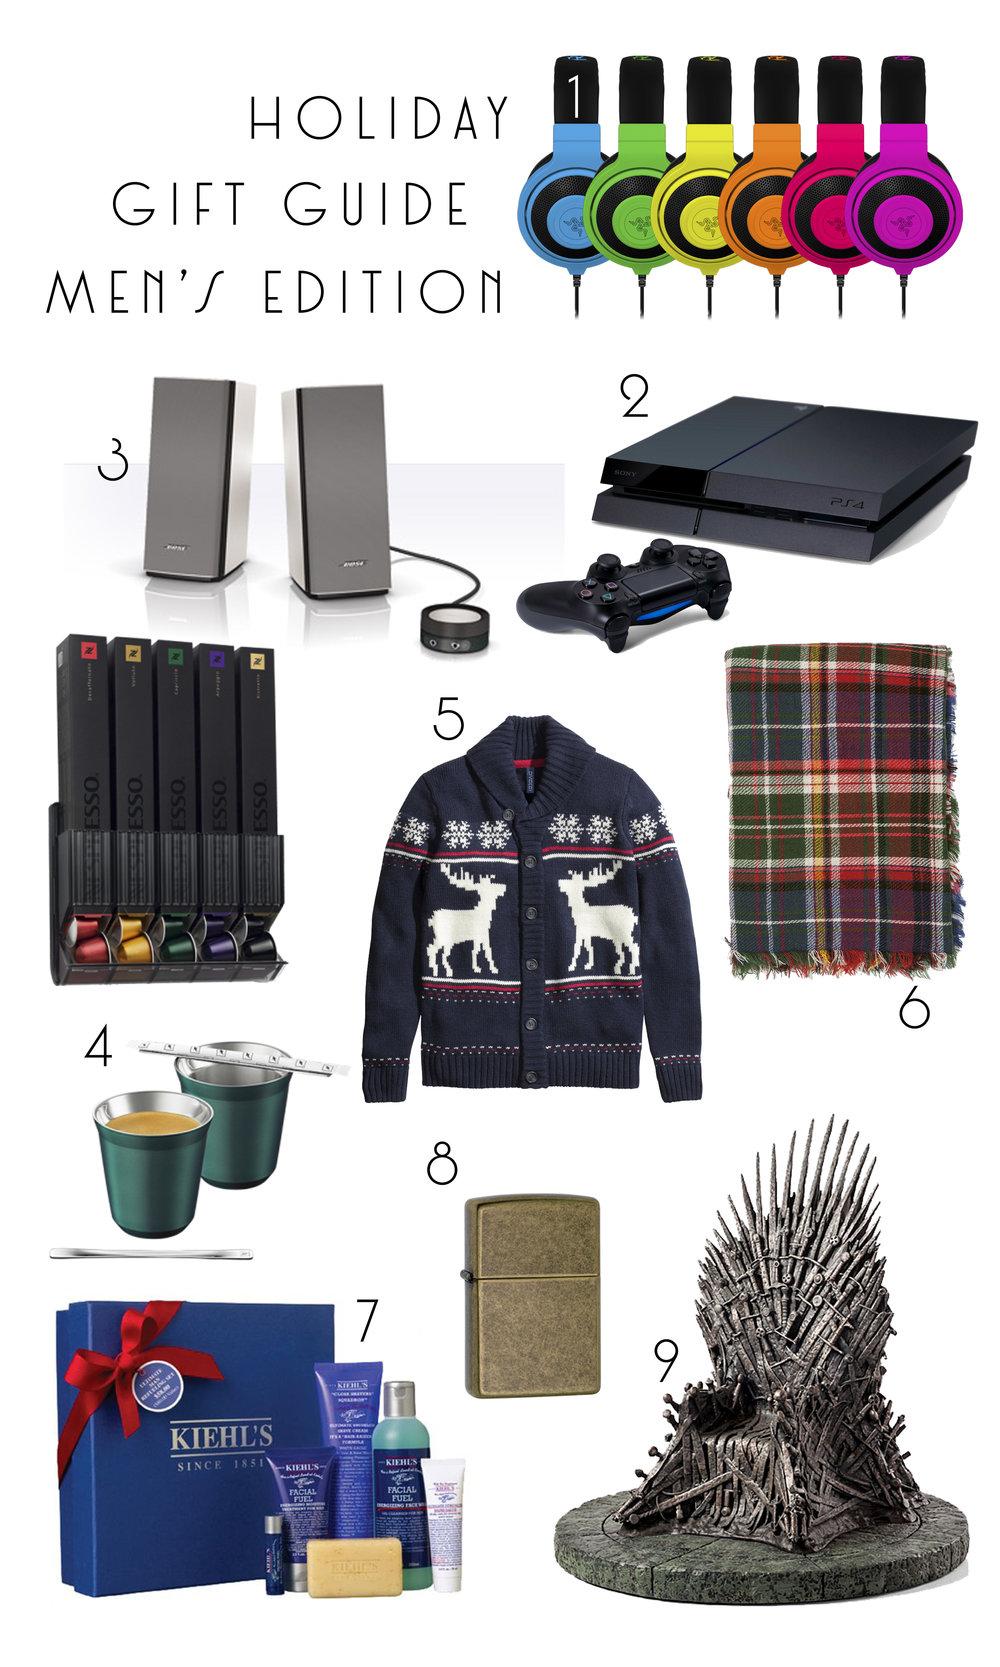 Christmas Gift Guide - HIS Edition